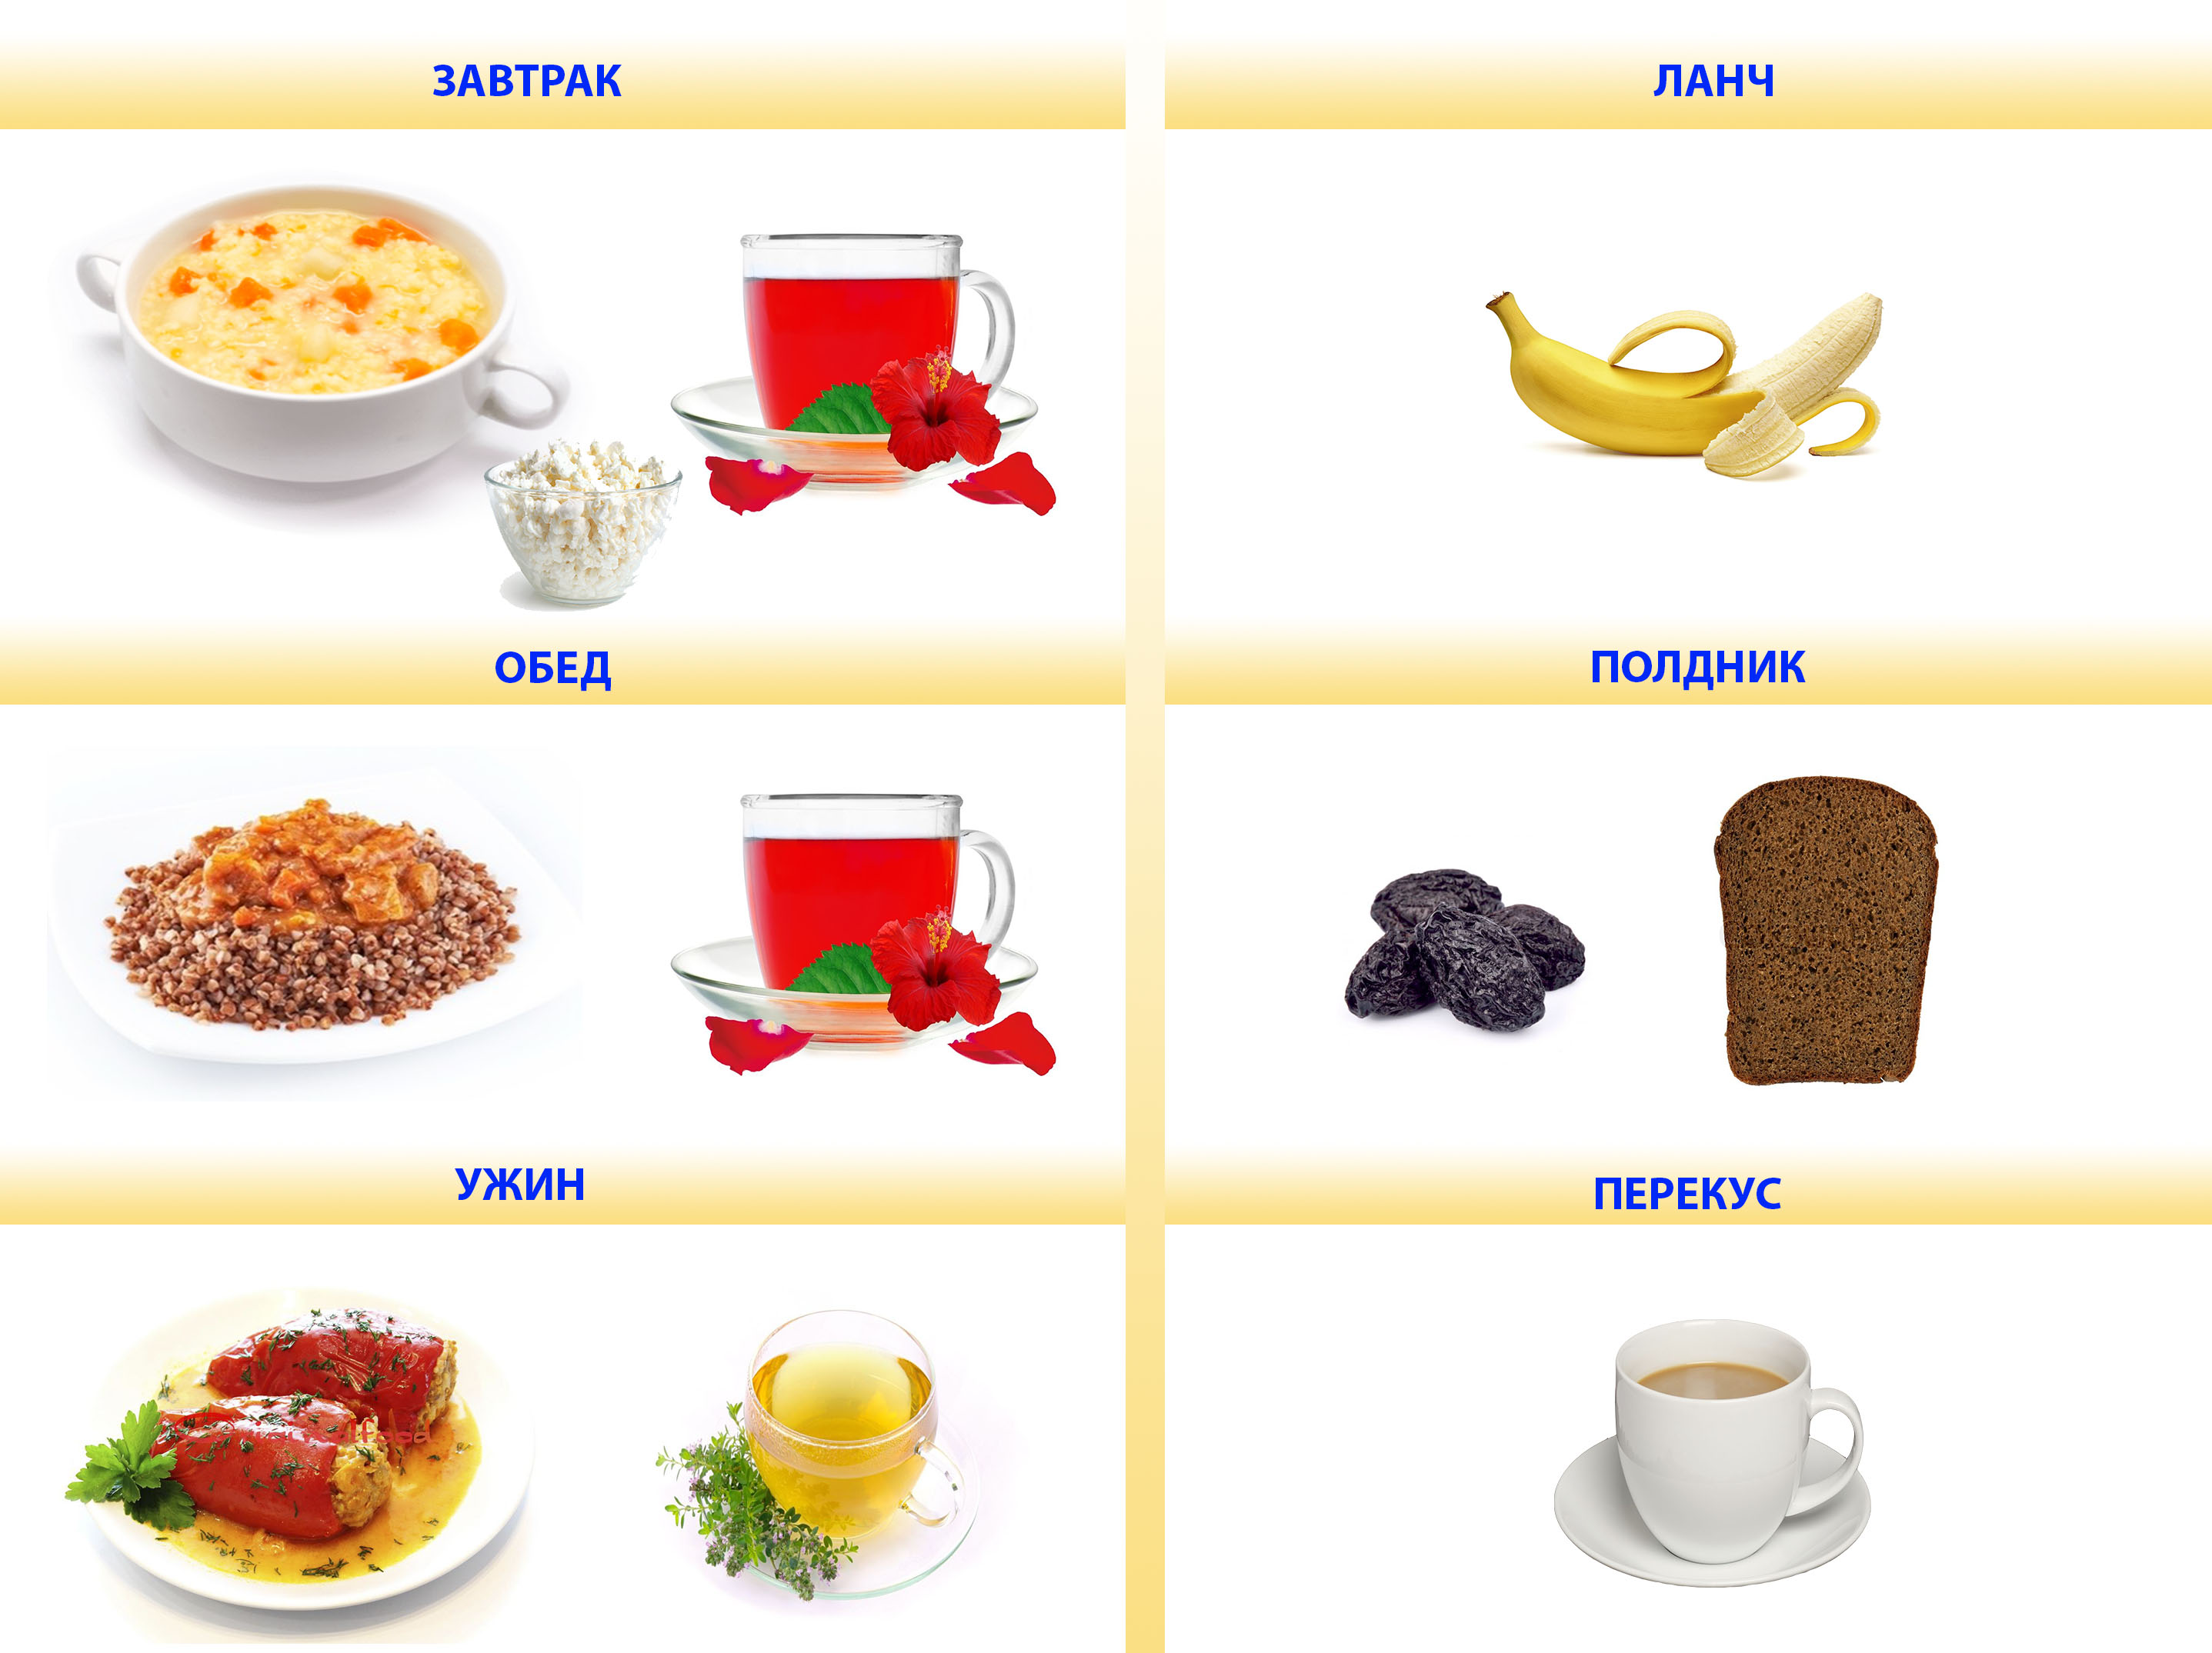 пример меню на 1500 калорий